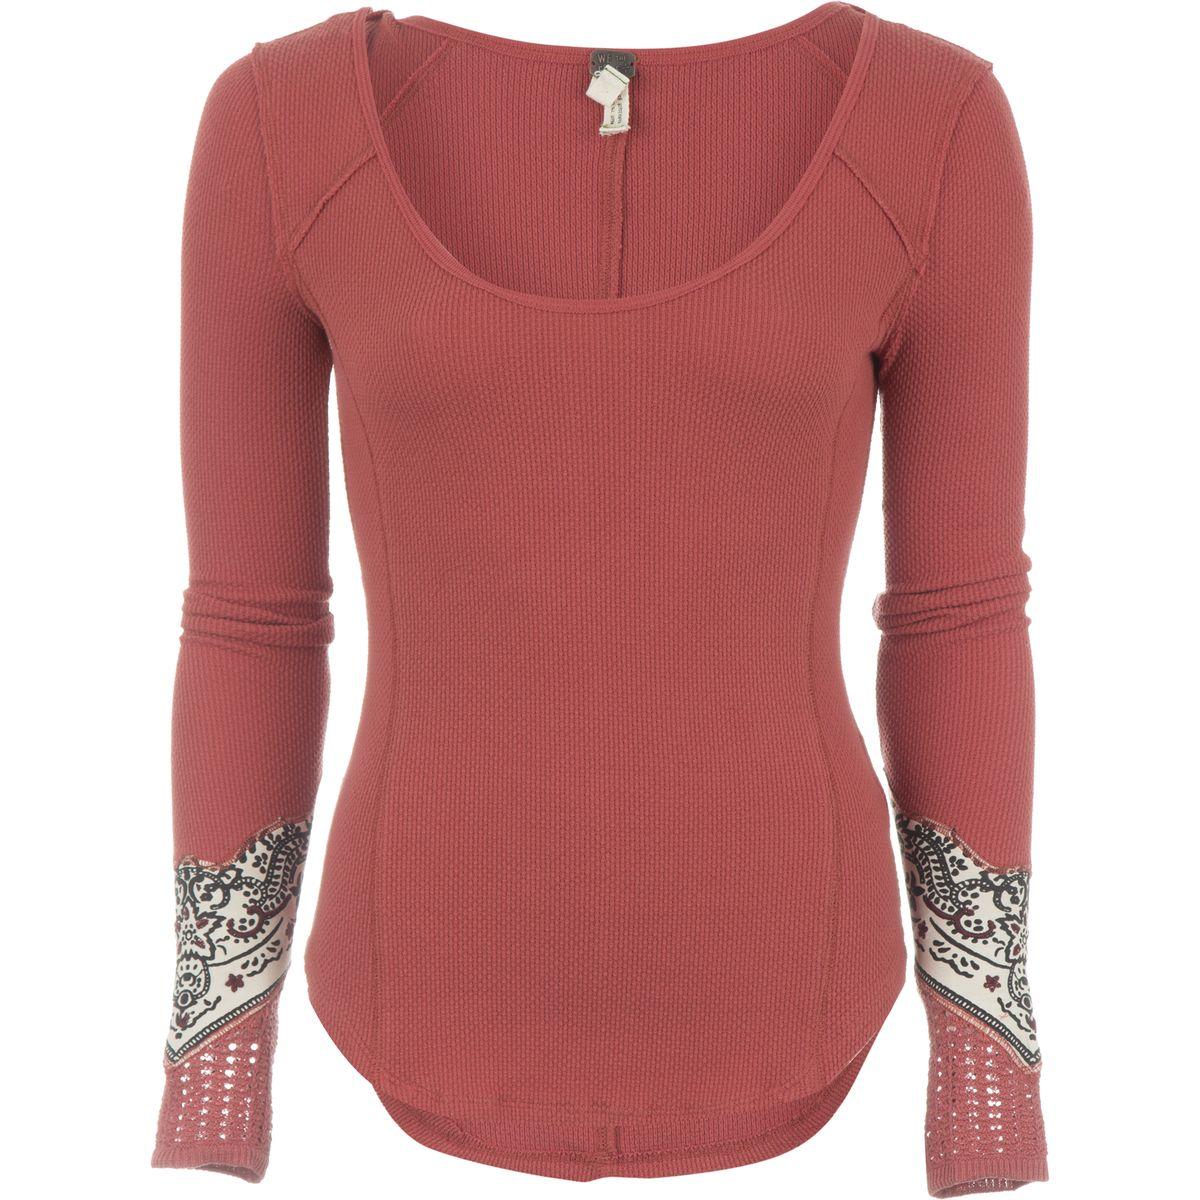 Free People Bandana Cuff Top - Long-Sleeve - Women